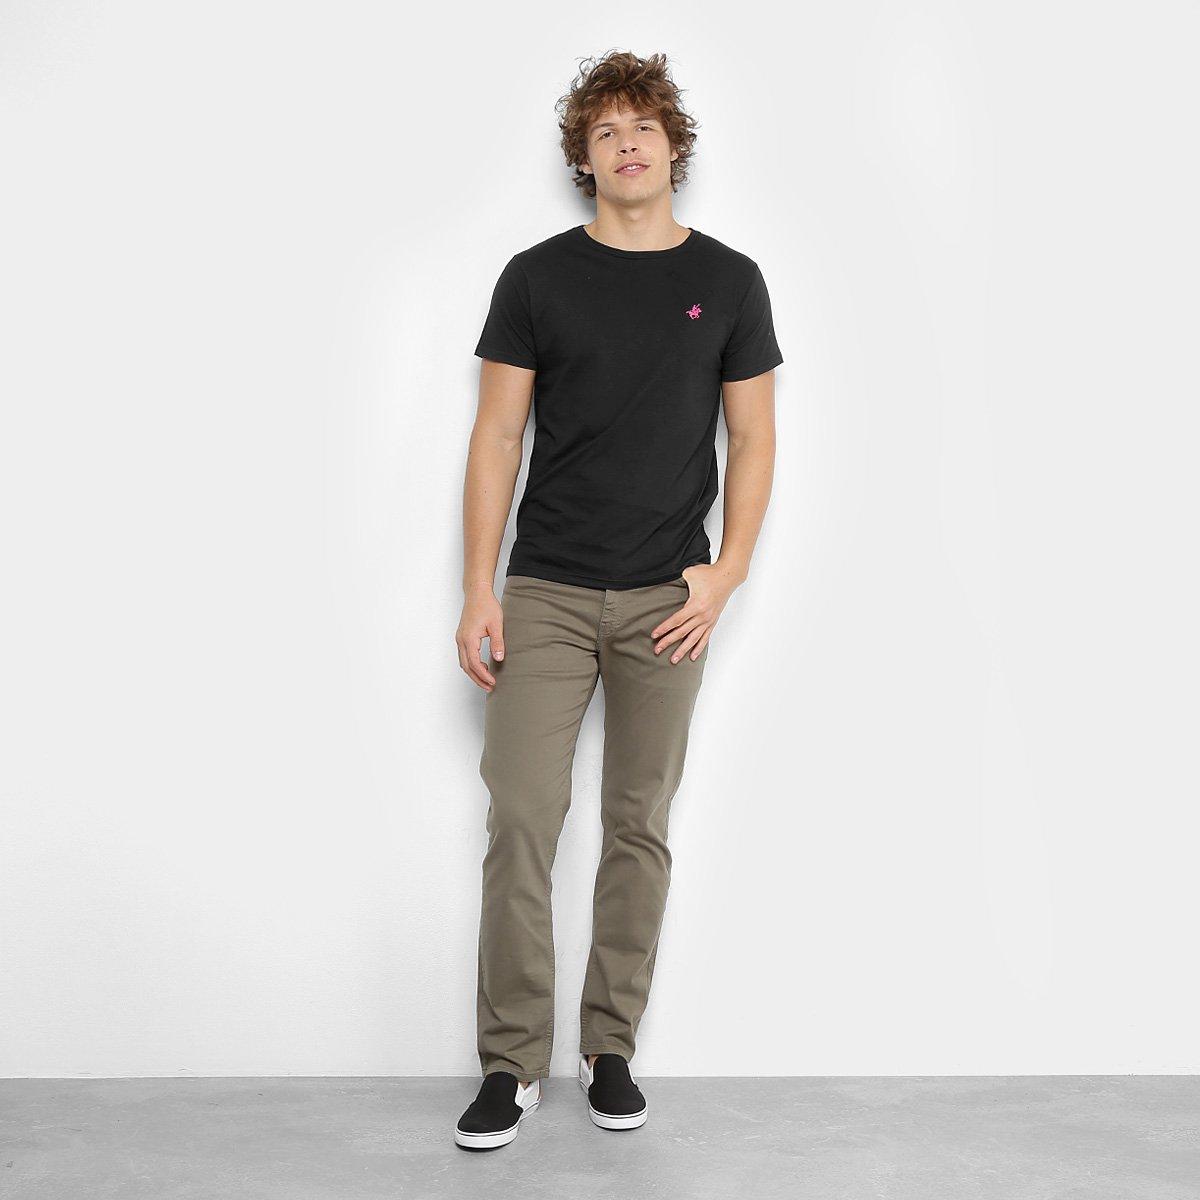 Camiseta Polo UP Gola Careca Masculina - Preto - Compre Agora  112437a40b29f